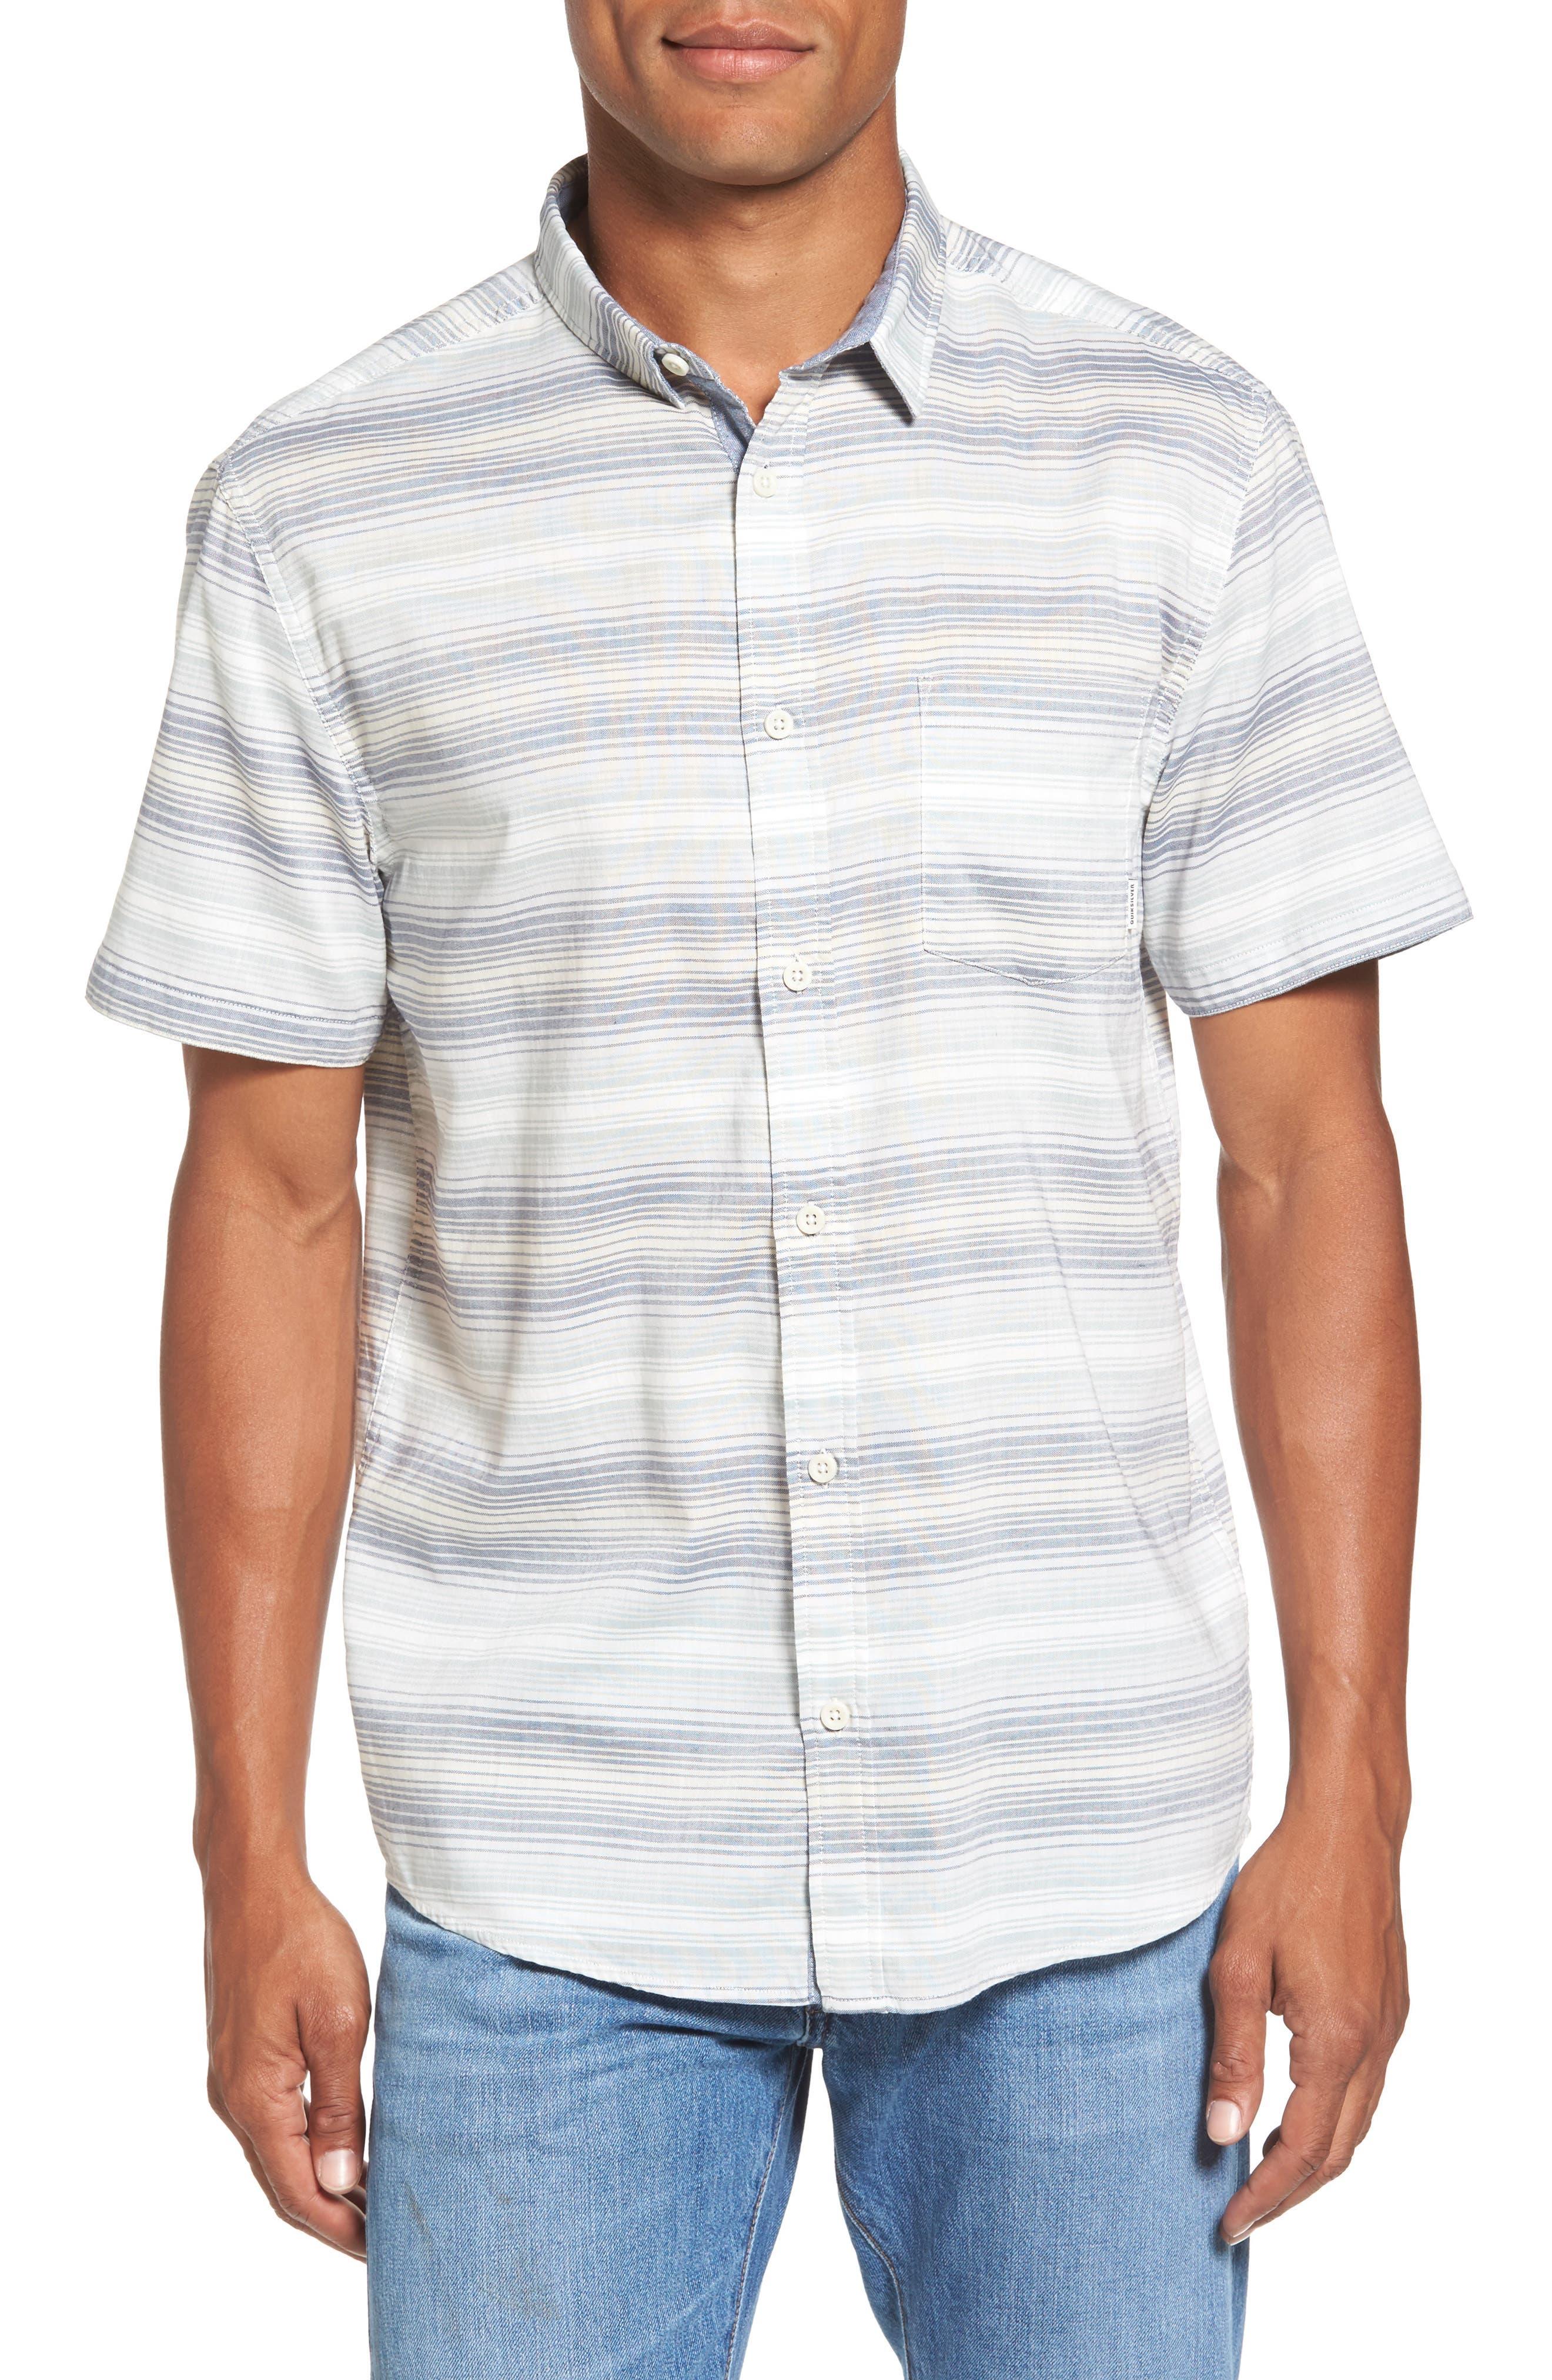 Aventail Stripe Shirt,                         Main,                         color,